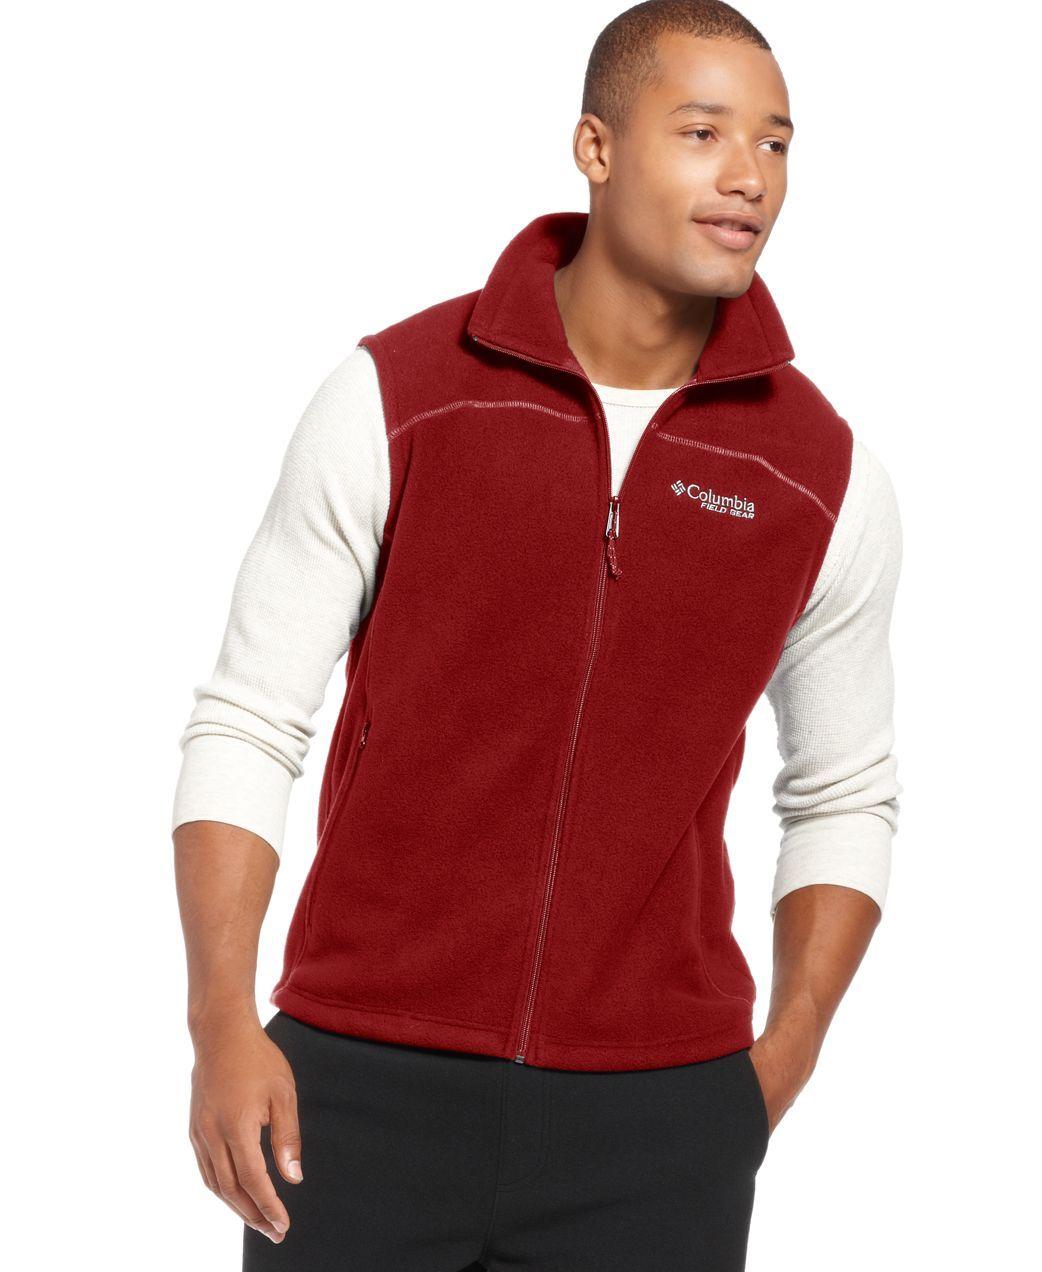 Columbia cathedral peak ii fleece vest products pinterest